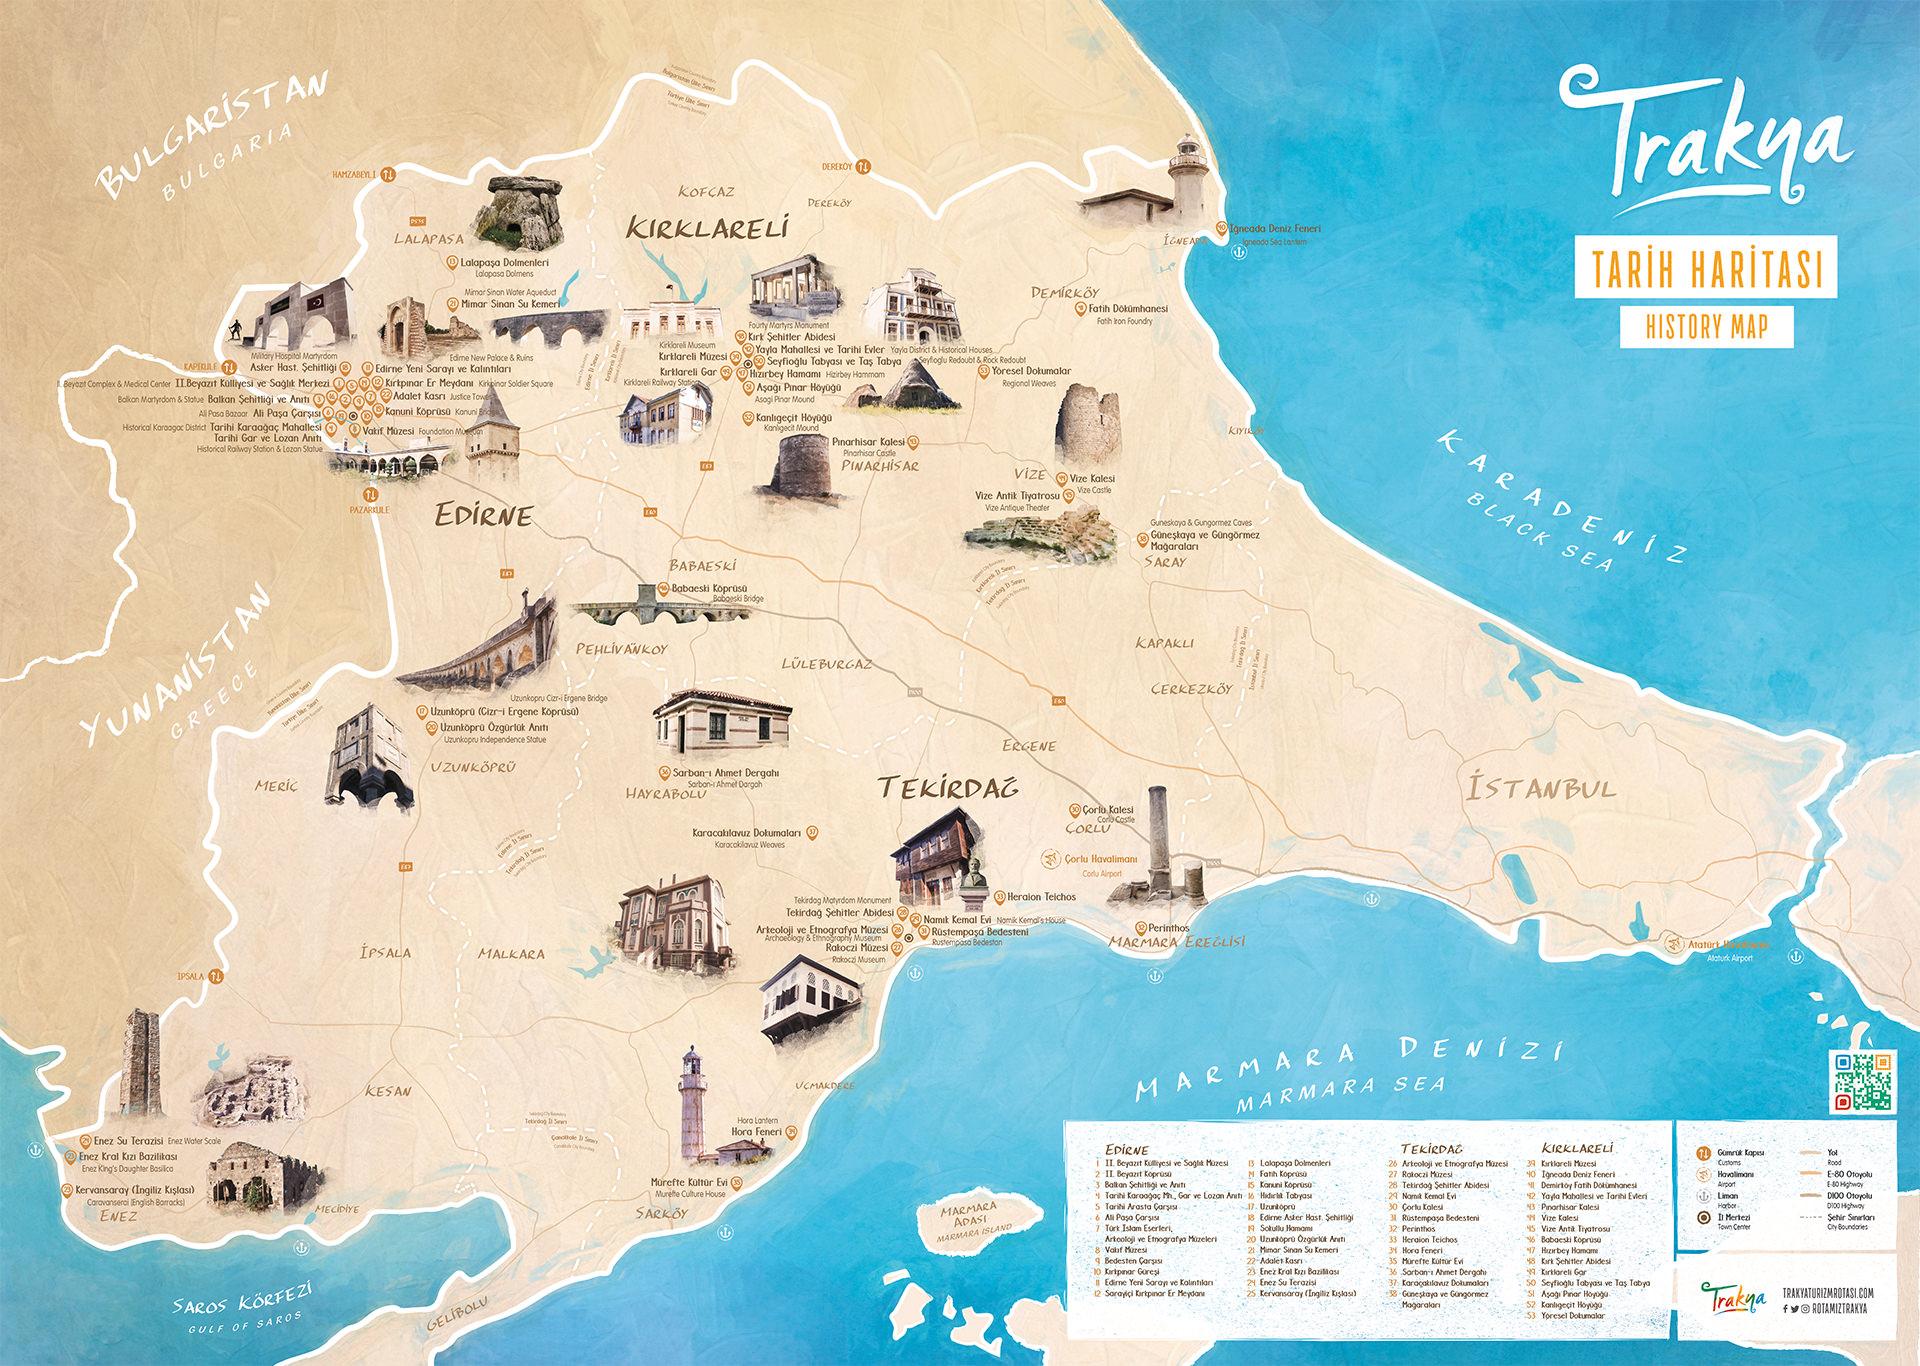 harita_tarih